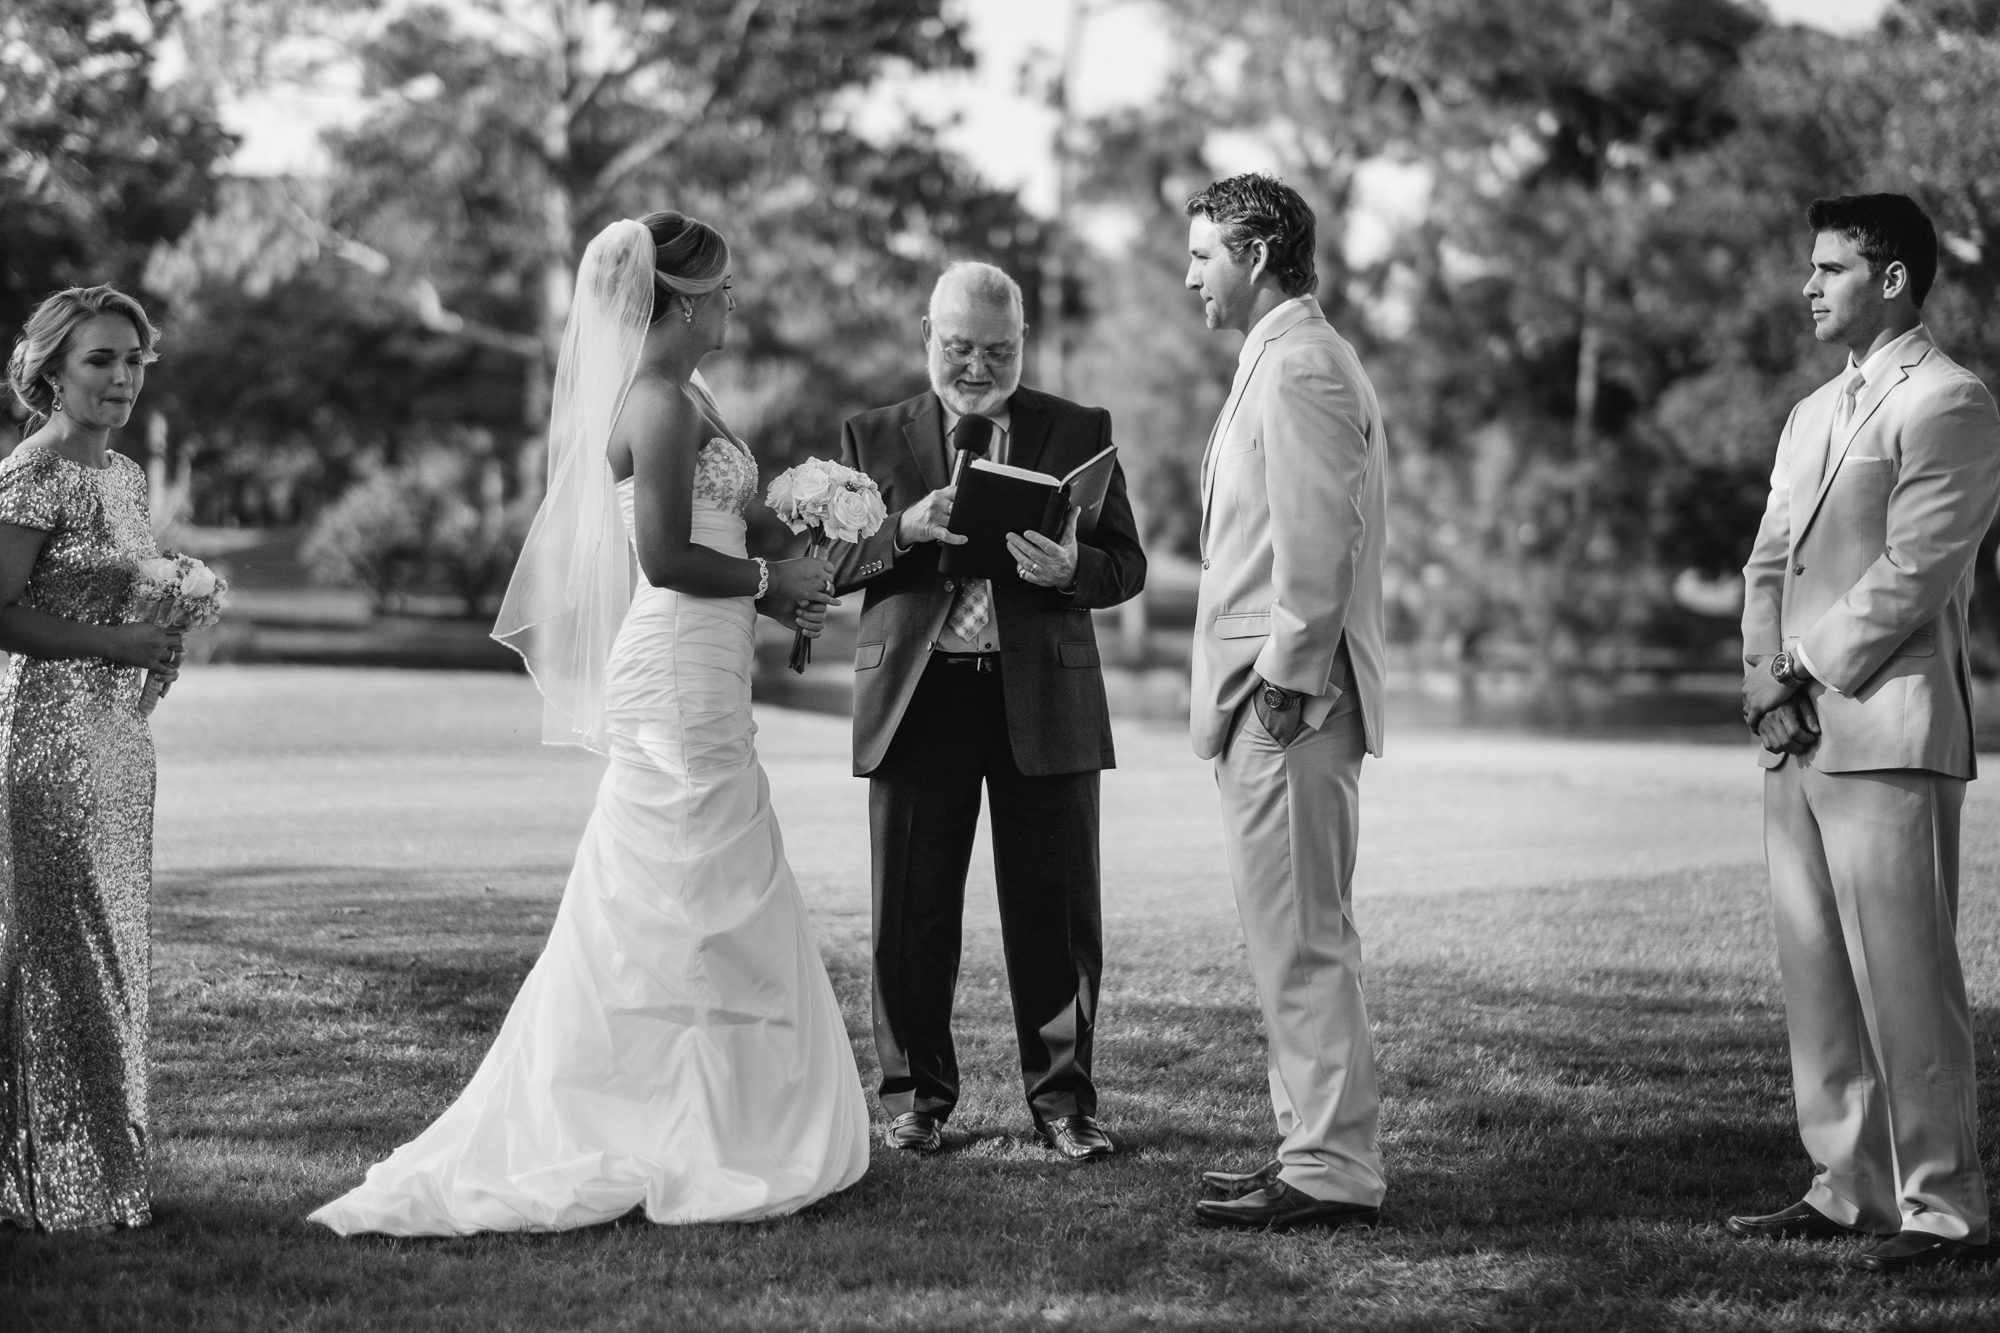 Heather-Chris-wedding-blog-14.jpg